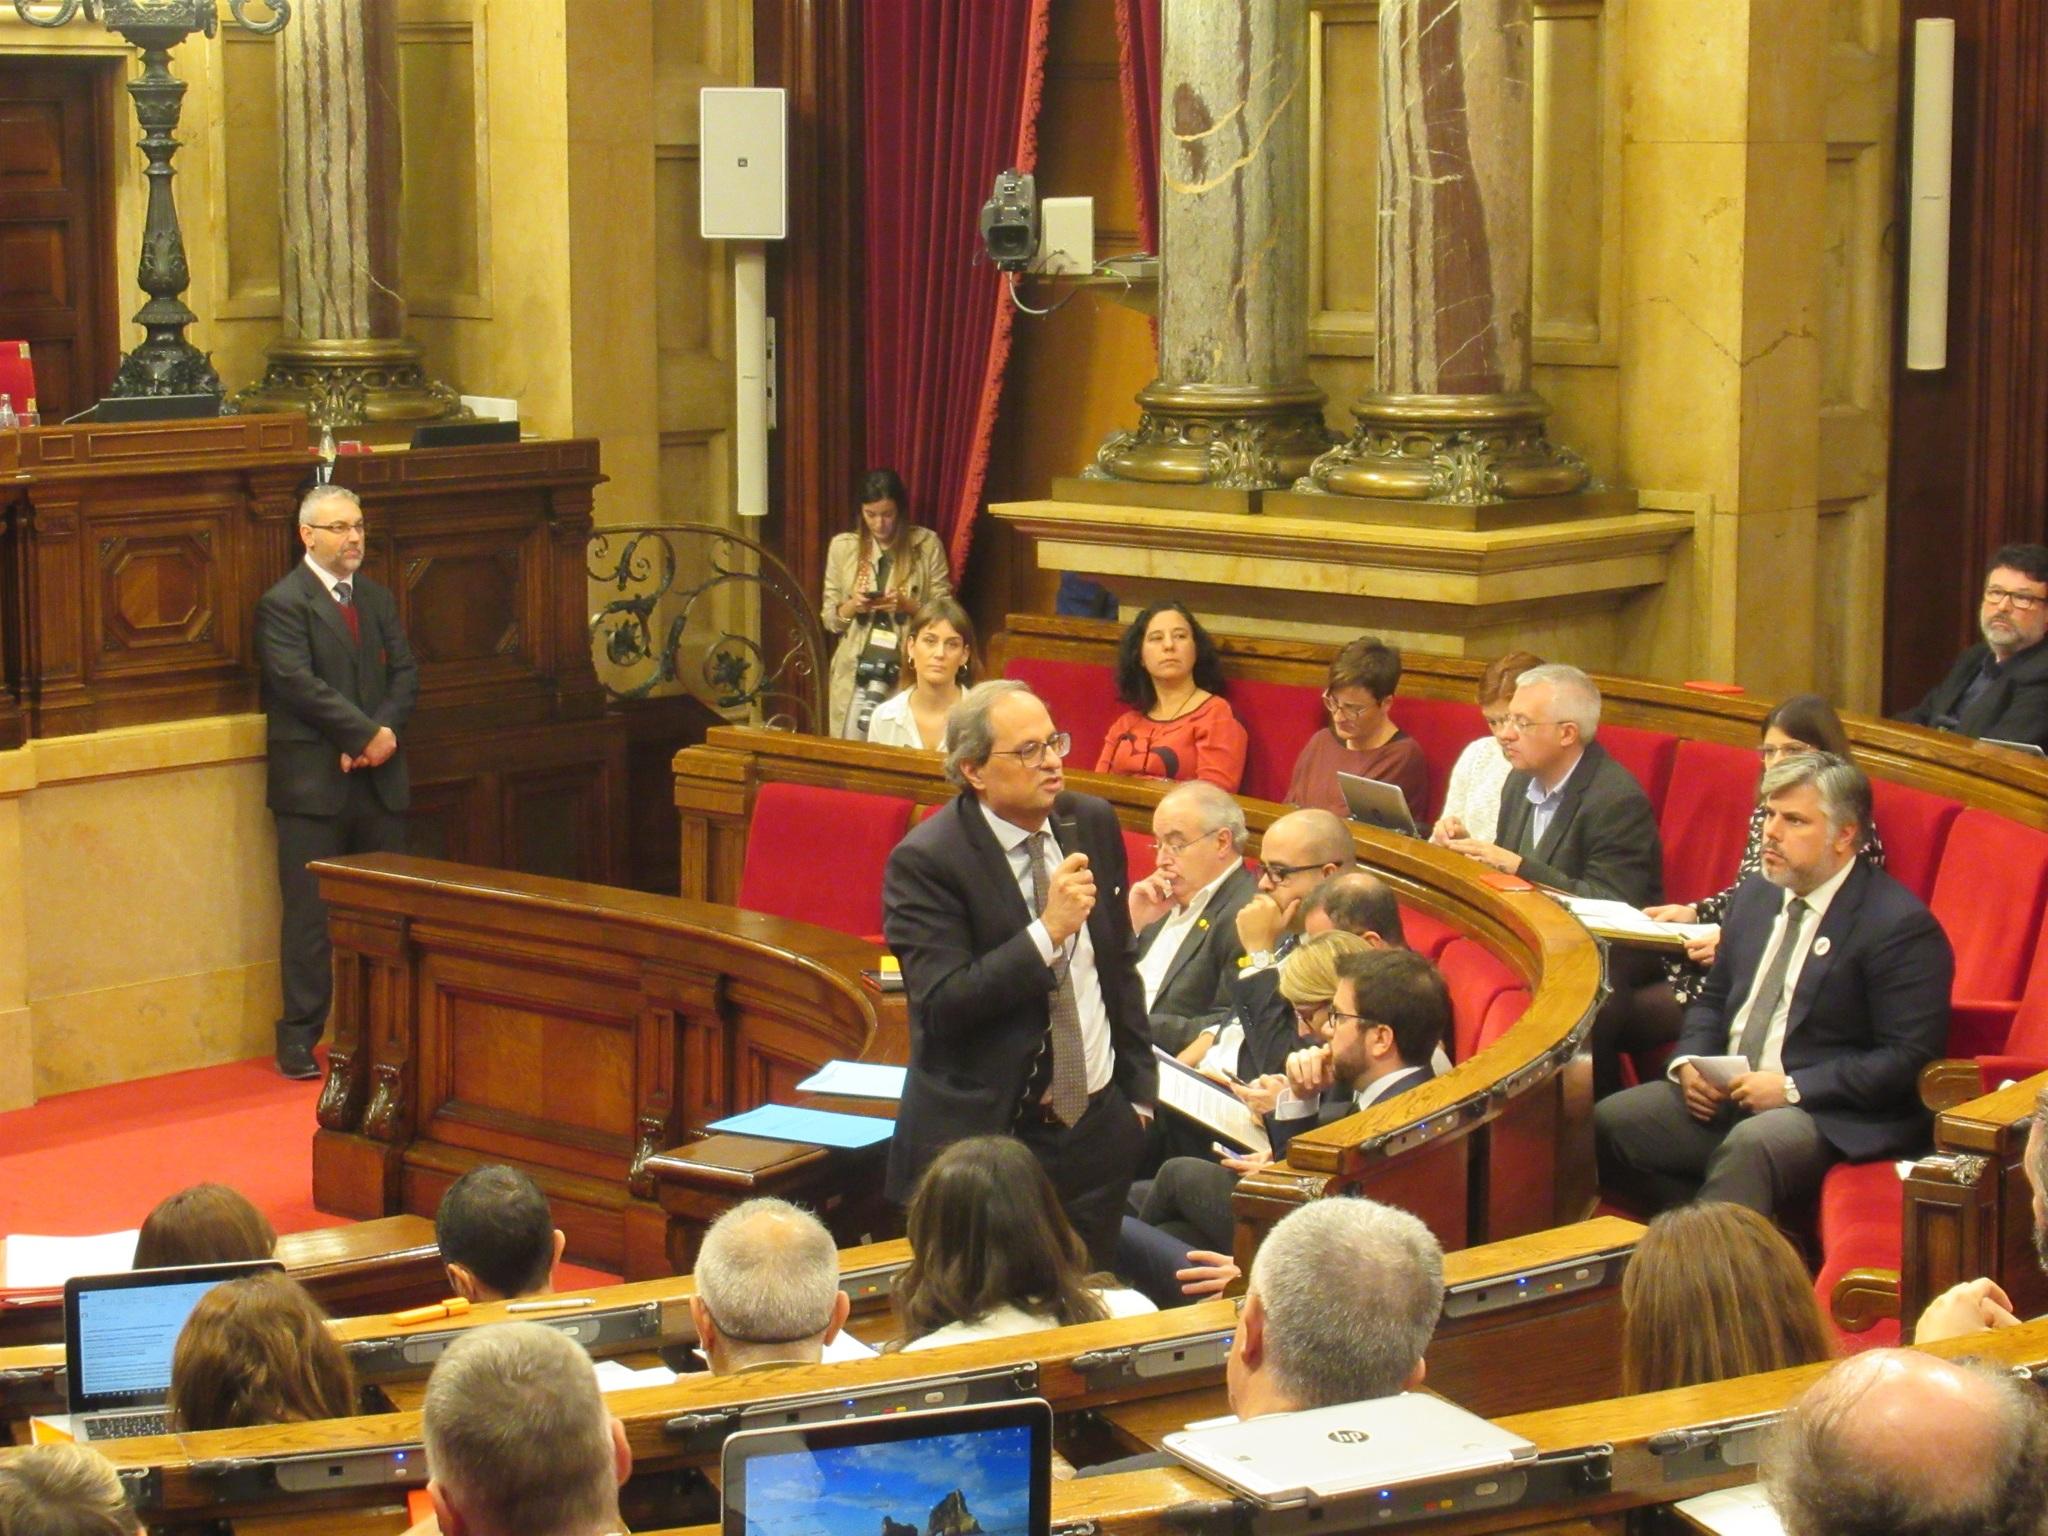 El presidente de la Generalitat, Quim Torra, en la sesión de control del Parlament